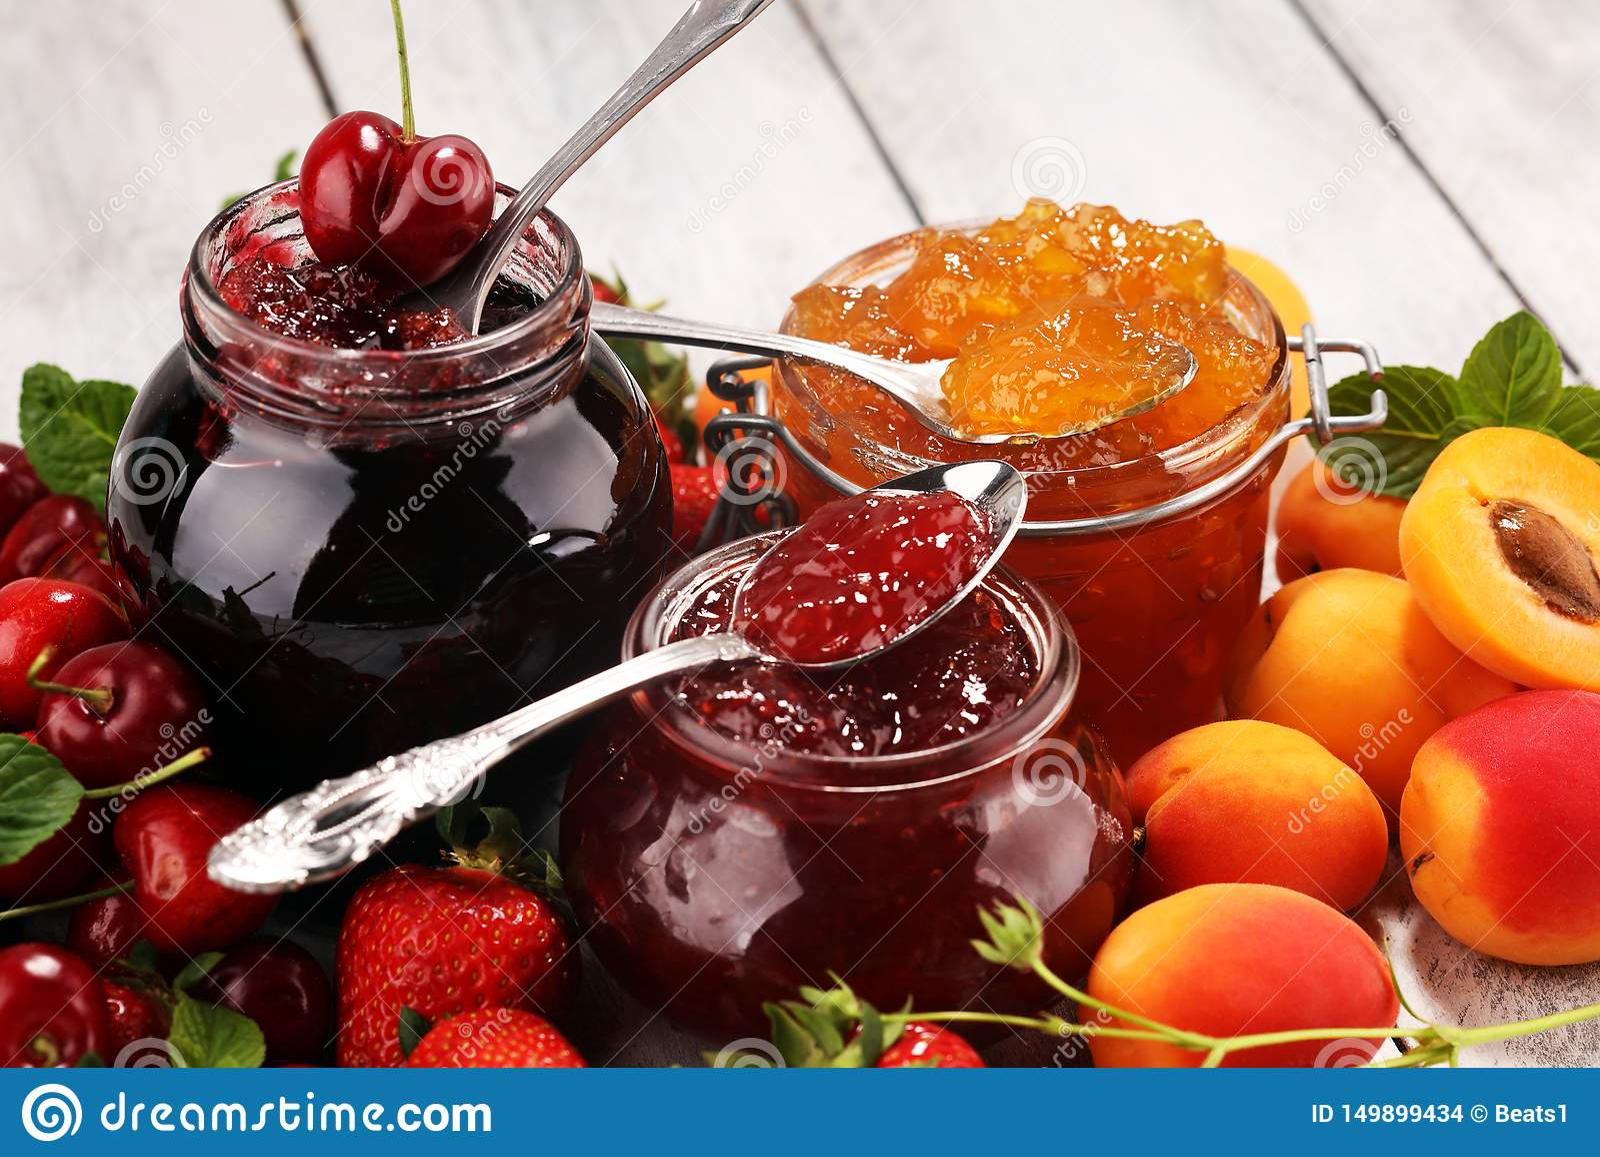 Asortyment d?emy, sezonowe jagody, morela, mennica i owoc, marmoladowy lub confiture